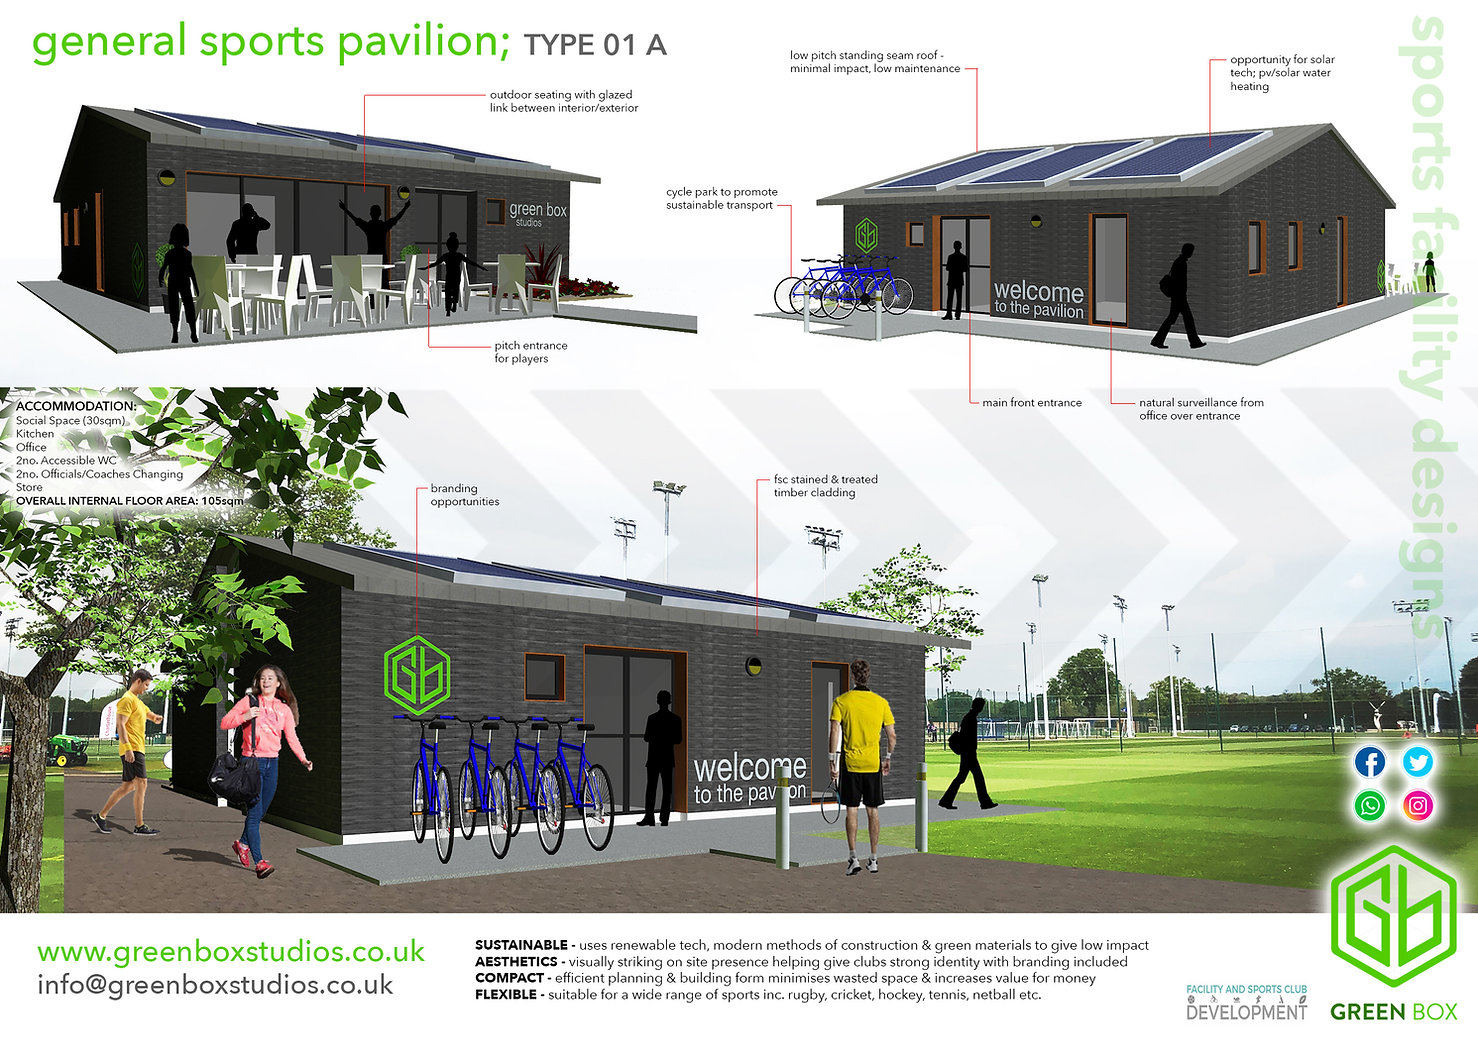 GBS sports pavilion type 01 A.jpg